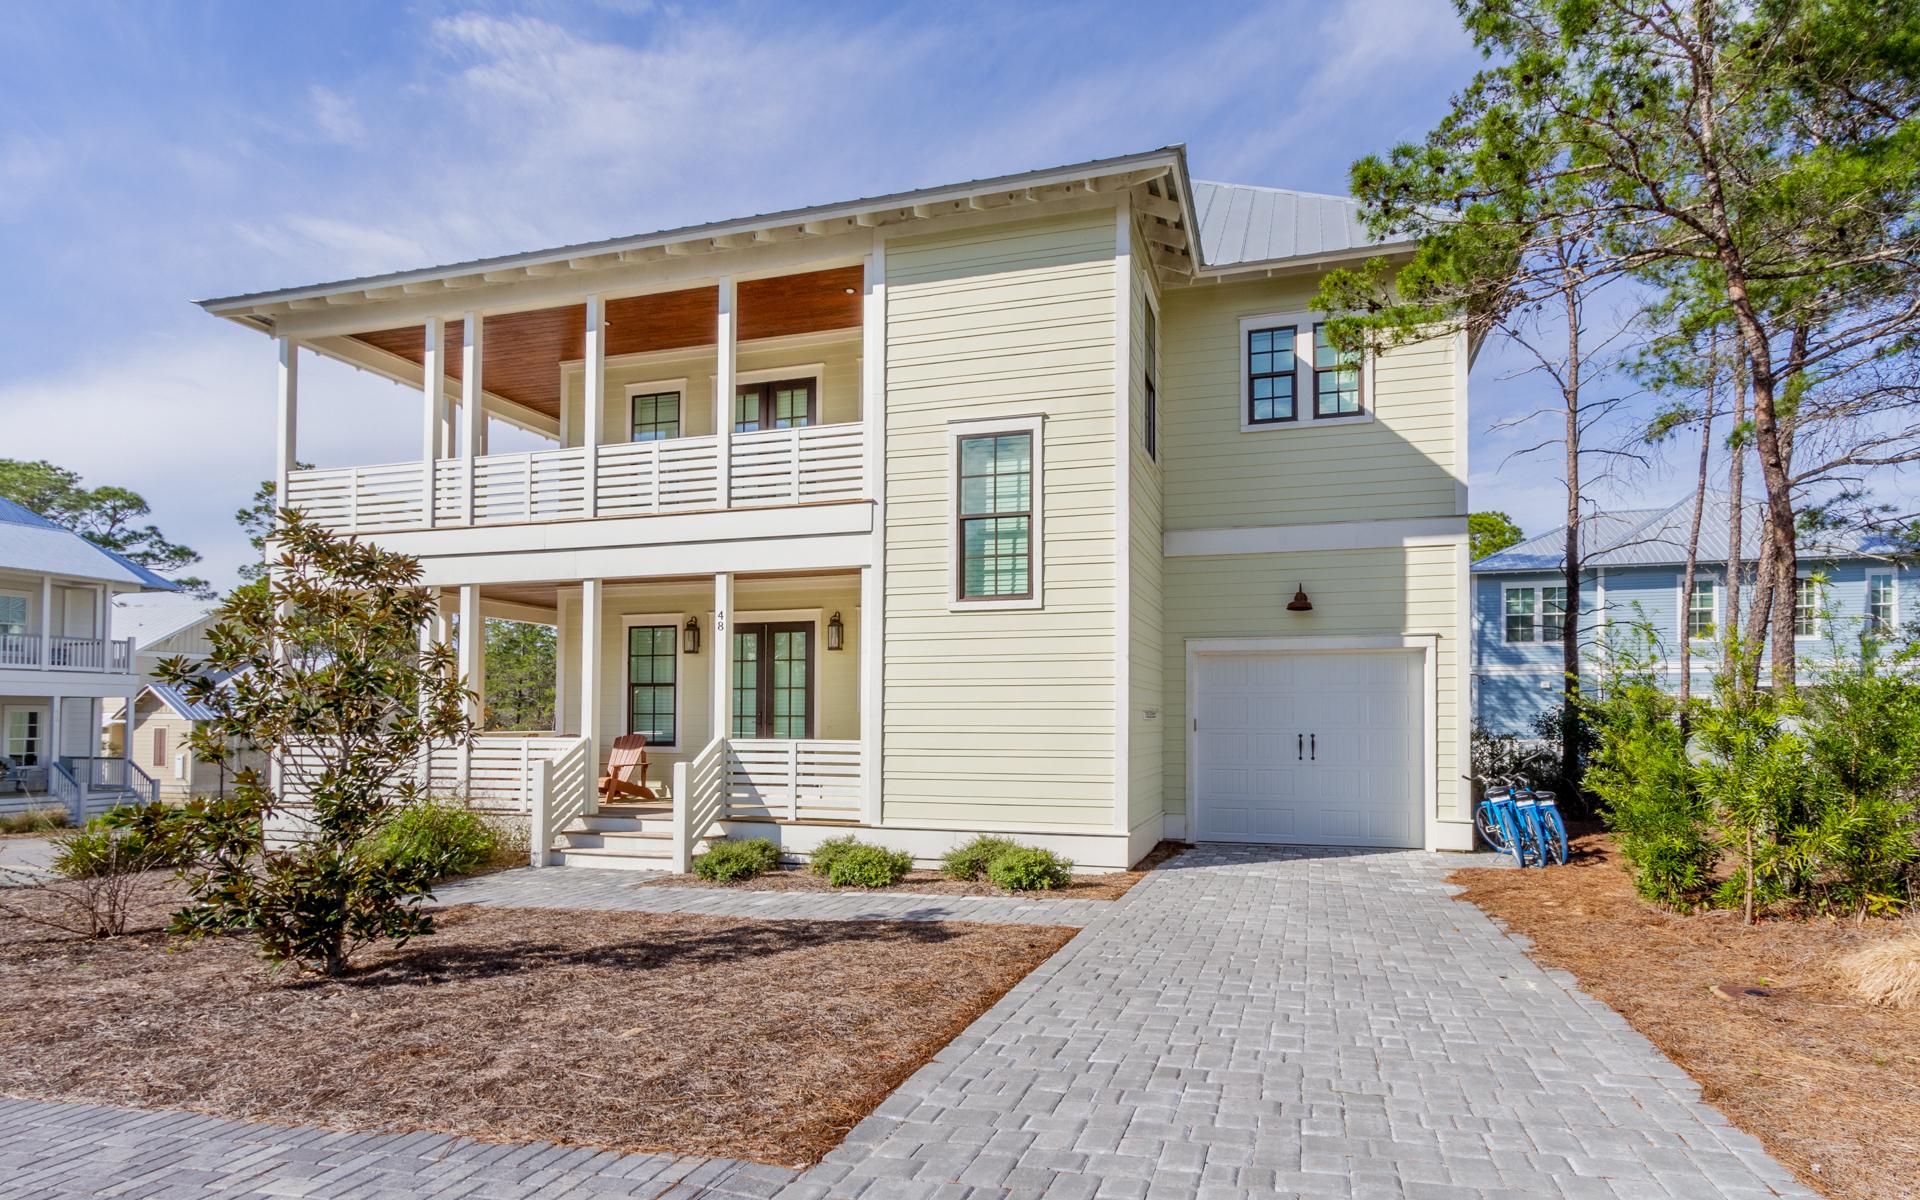 48 Ibis | Oversee Rentals Ibis Point Community House Floor Plan on mill creek floor plans, community architecture, community bathroom floor plans,